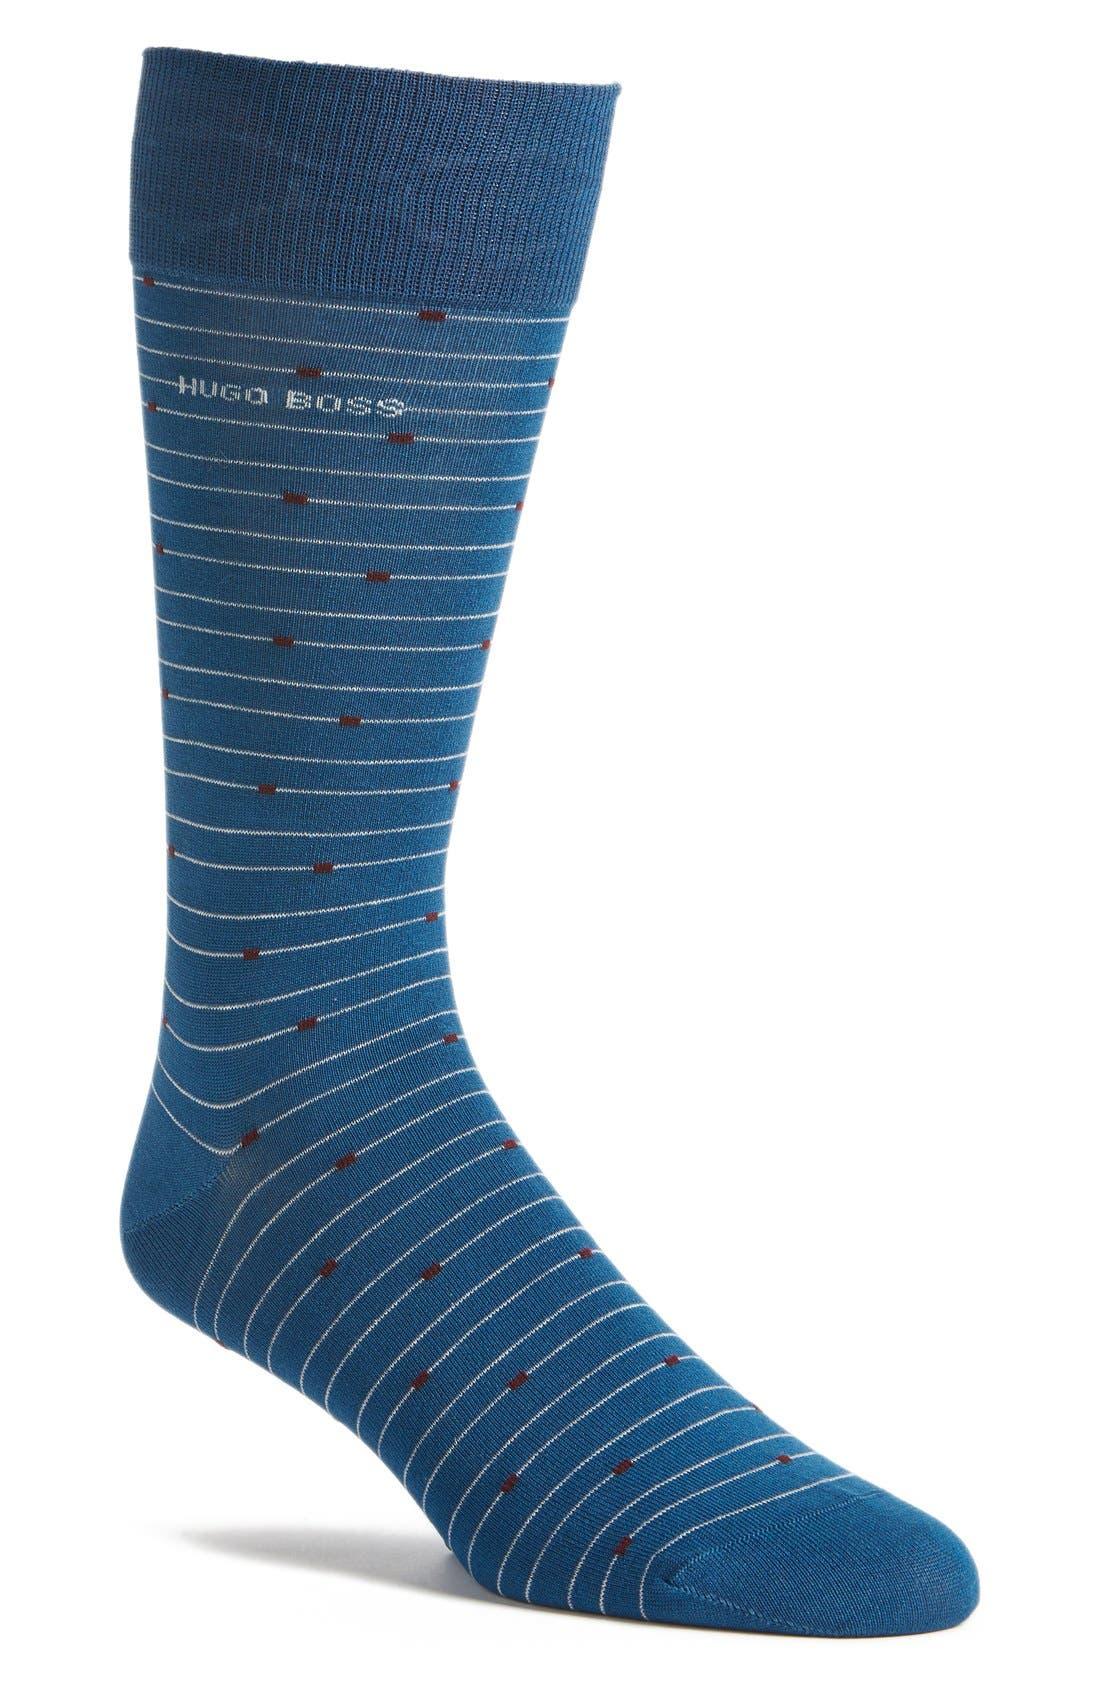 Find great deals on eBay for nordstrom mens socks. Shop with confidence.